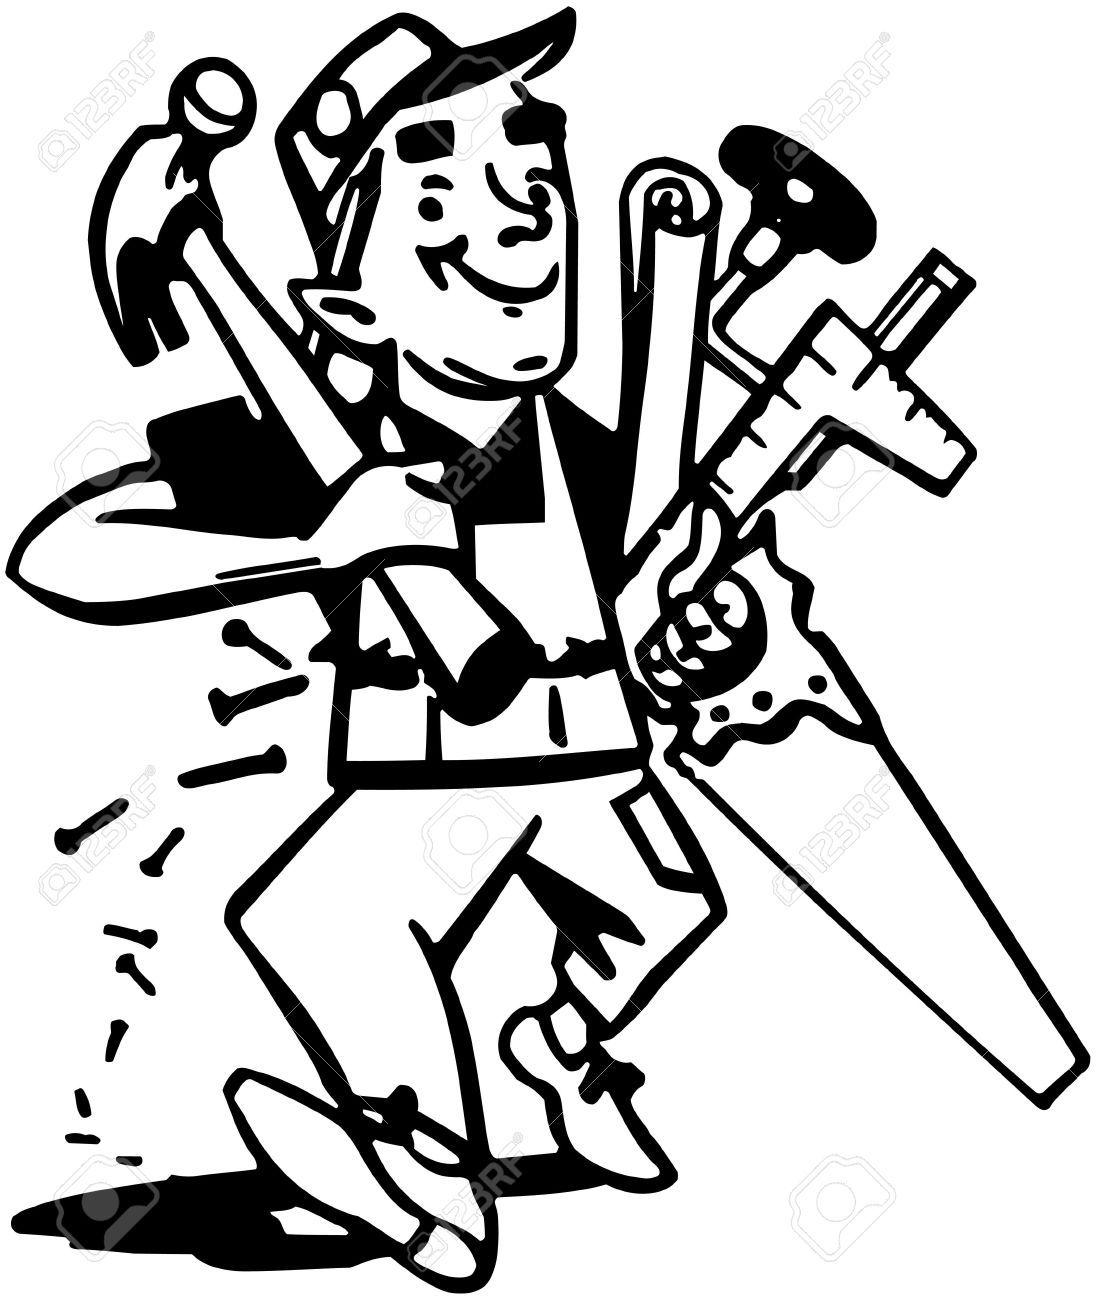 Carpenter Google Search Clip Art Hand Drawn Vector Illustrations Free Clip Art